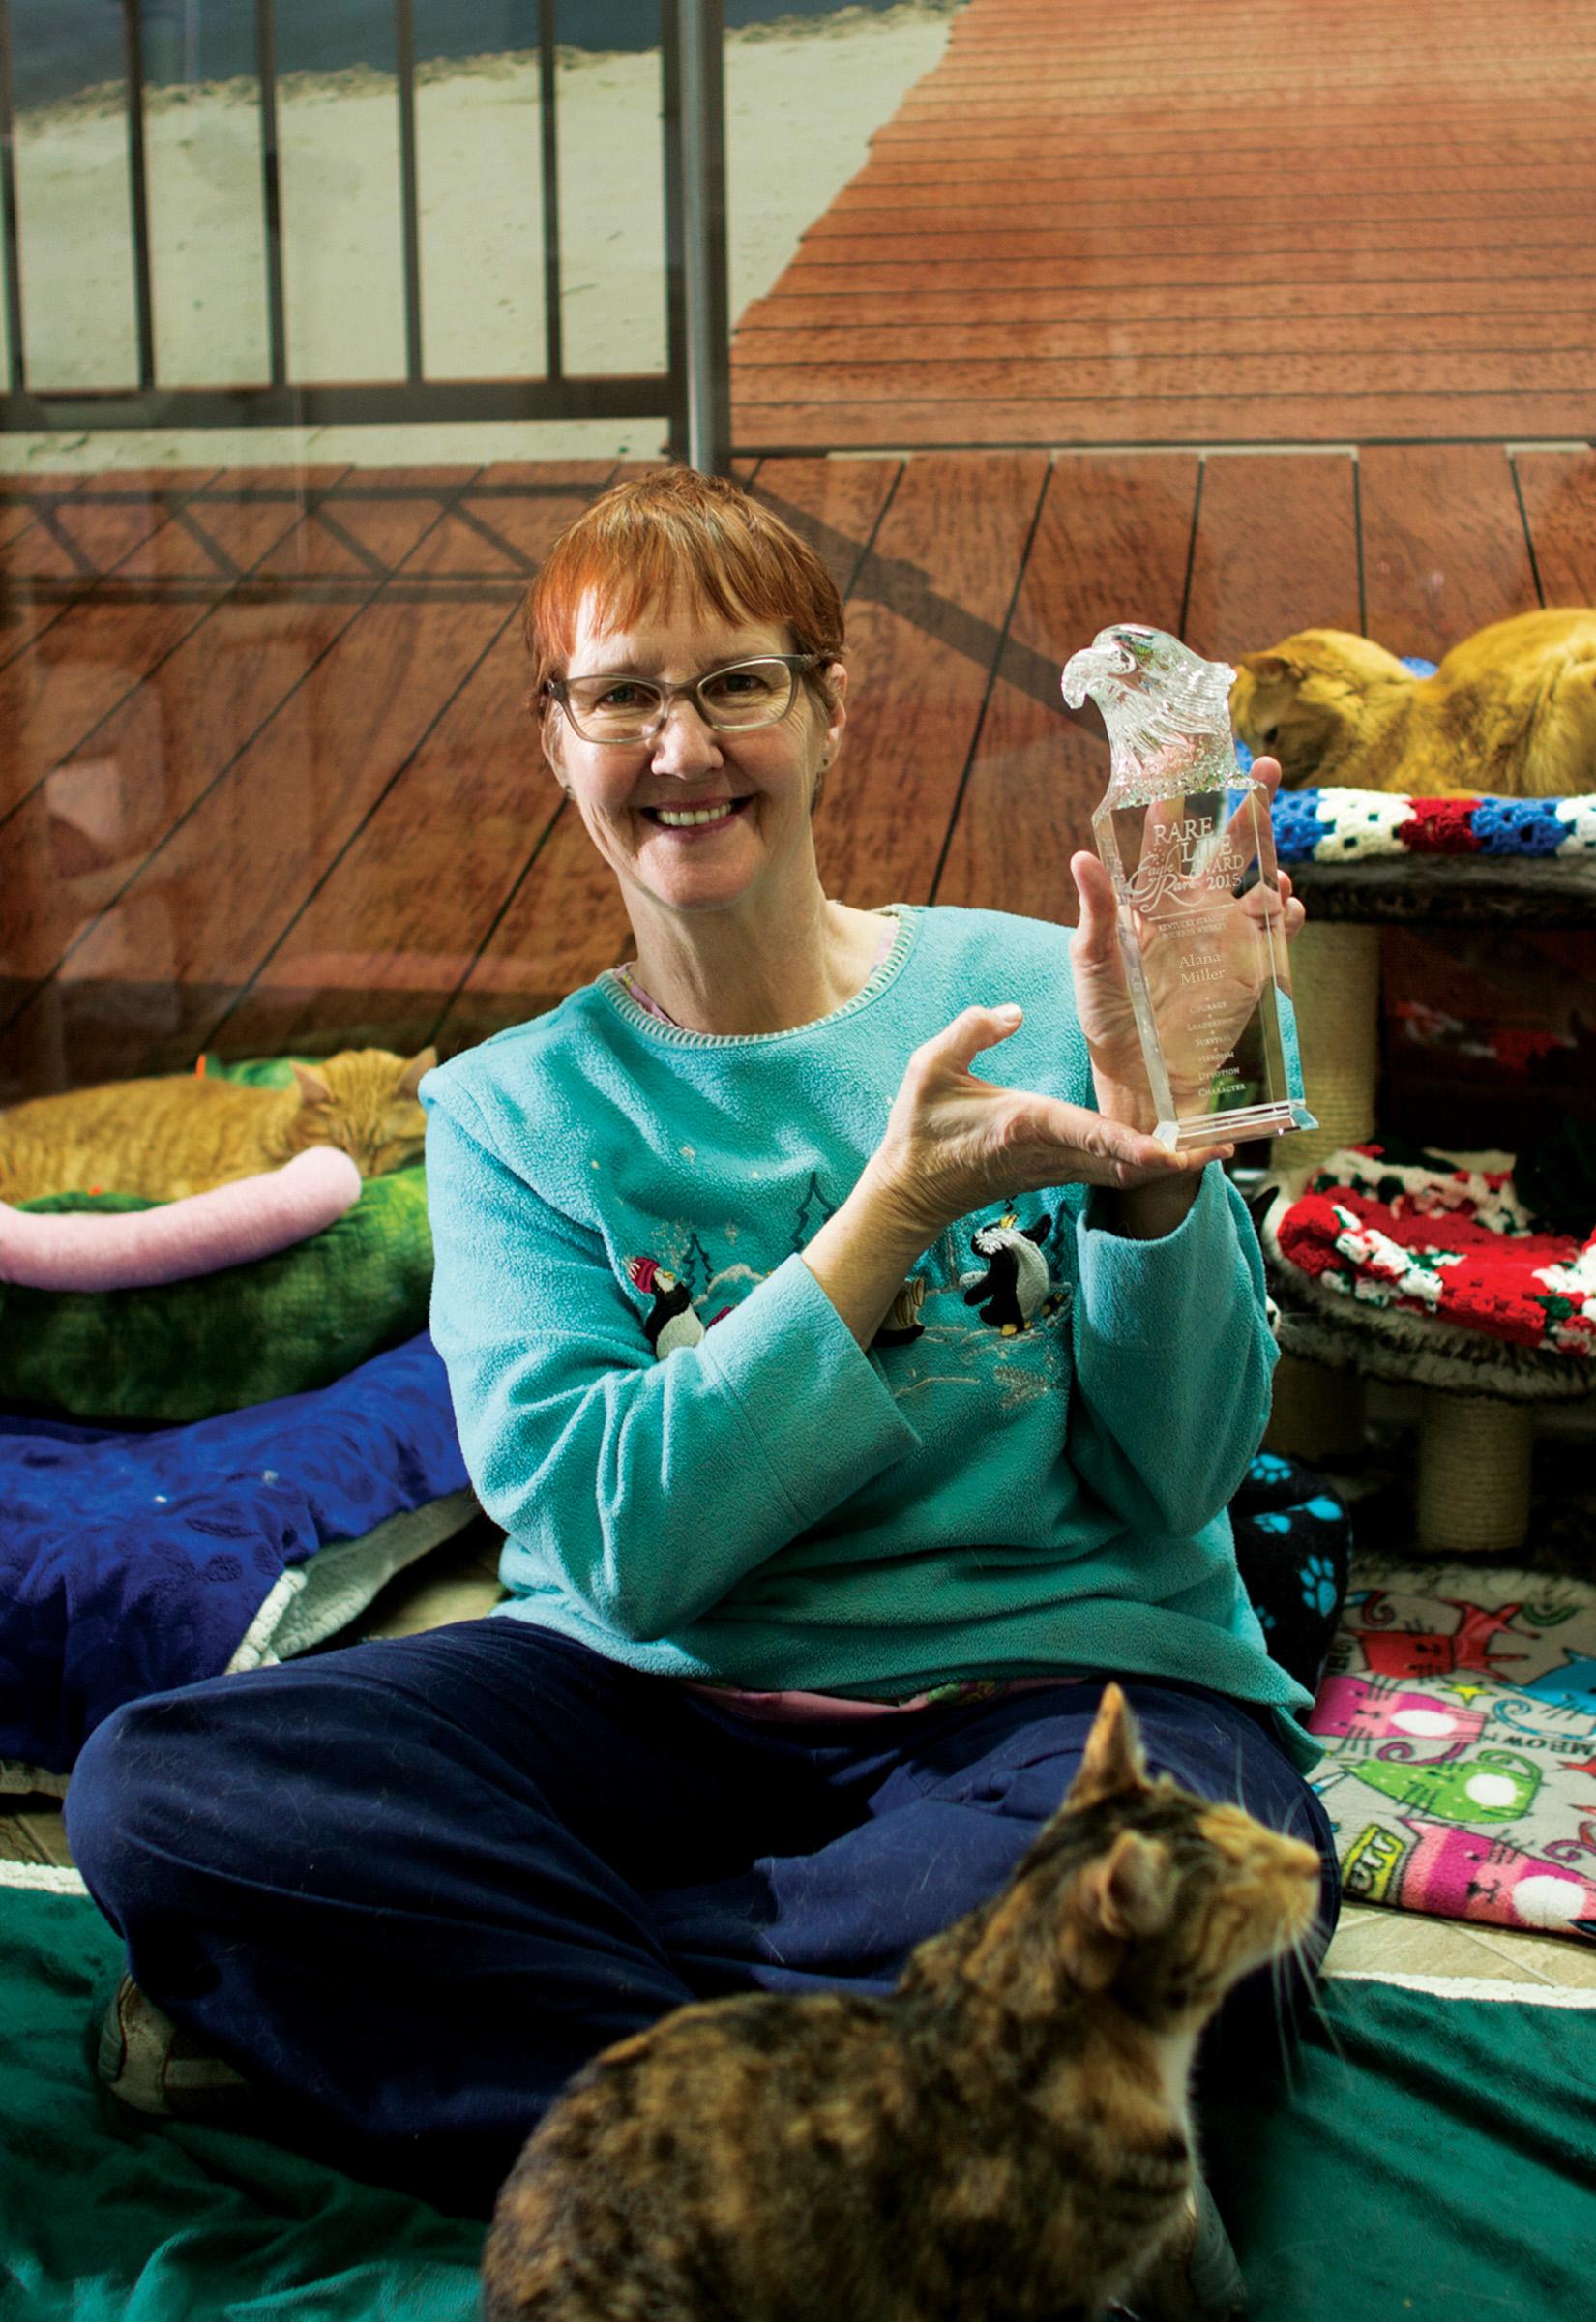 2015 Rare Life Award Presented To Alana Miller Of Blind